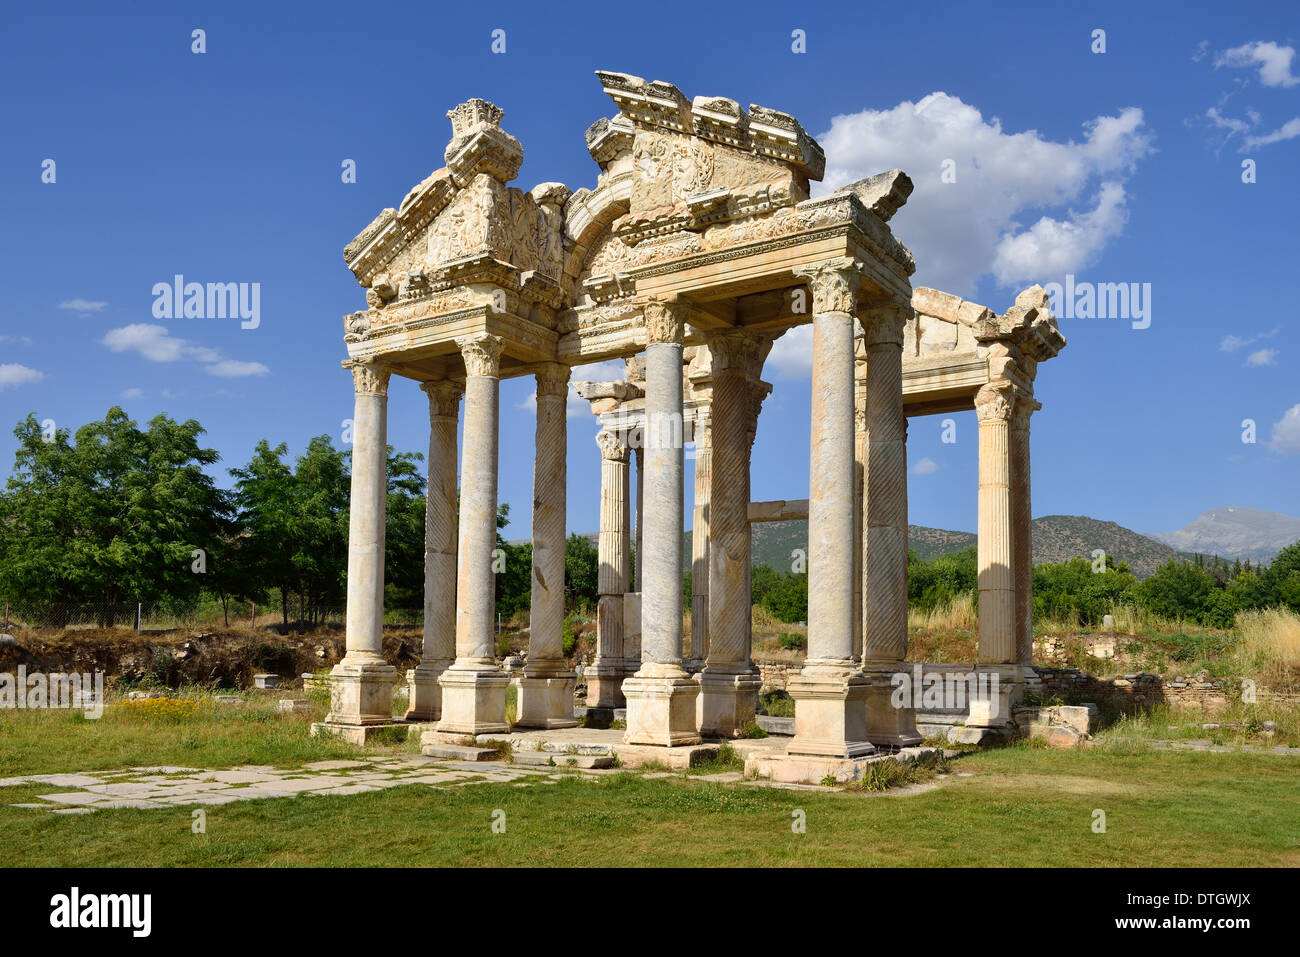 Antique tetrapylon at the archaelogical site of Aphrodisias, Caria, Aydin Province, Turkey - Stock Image